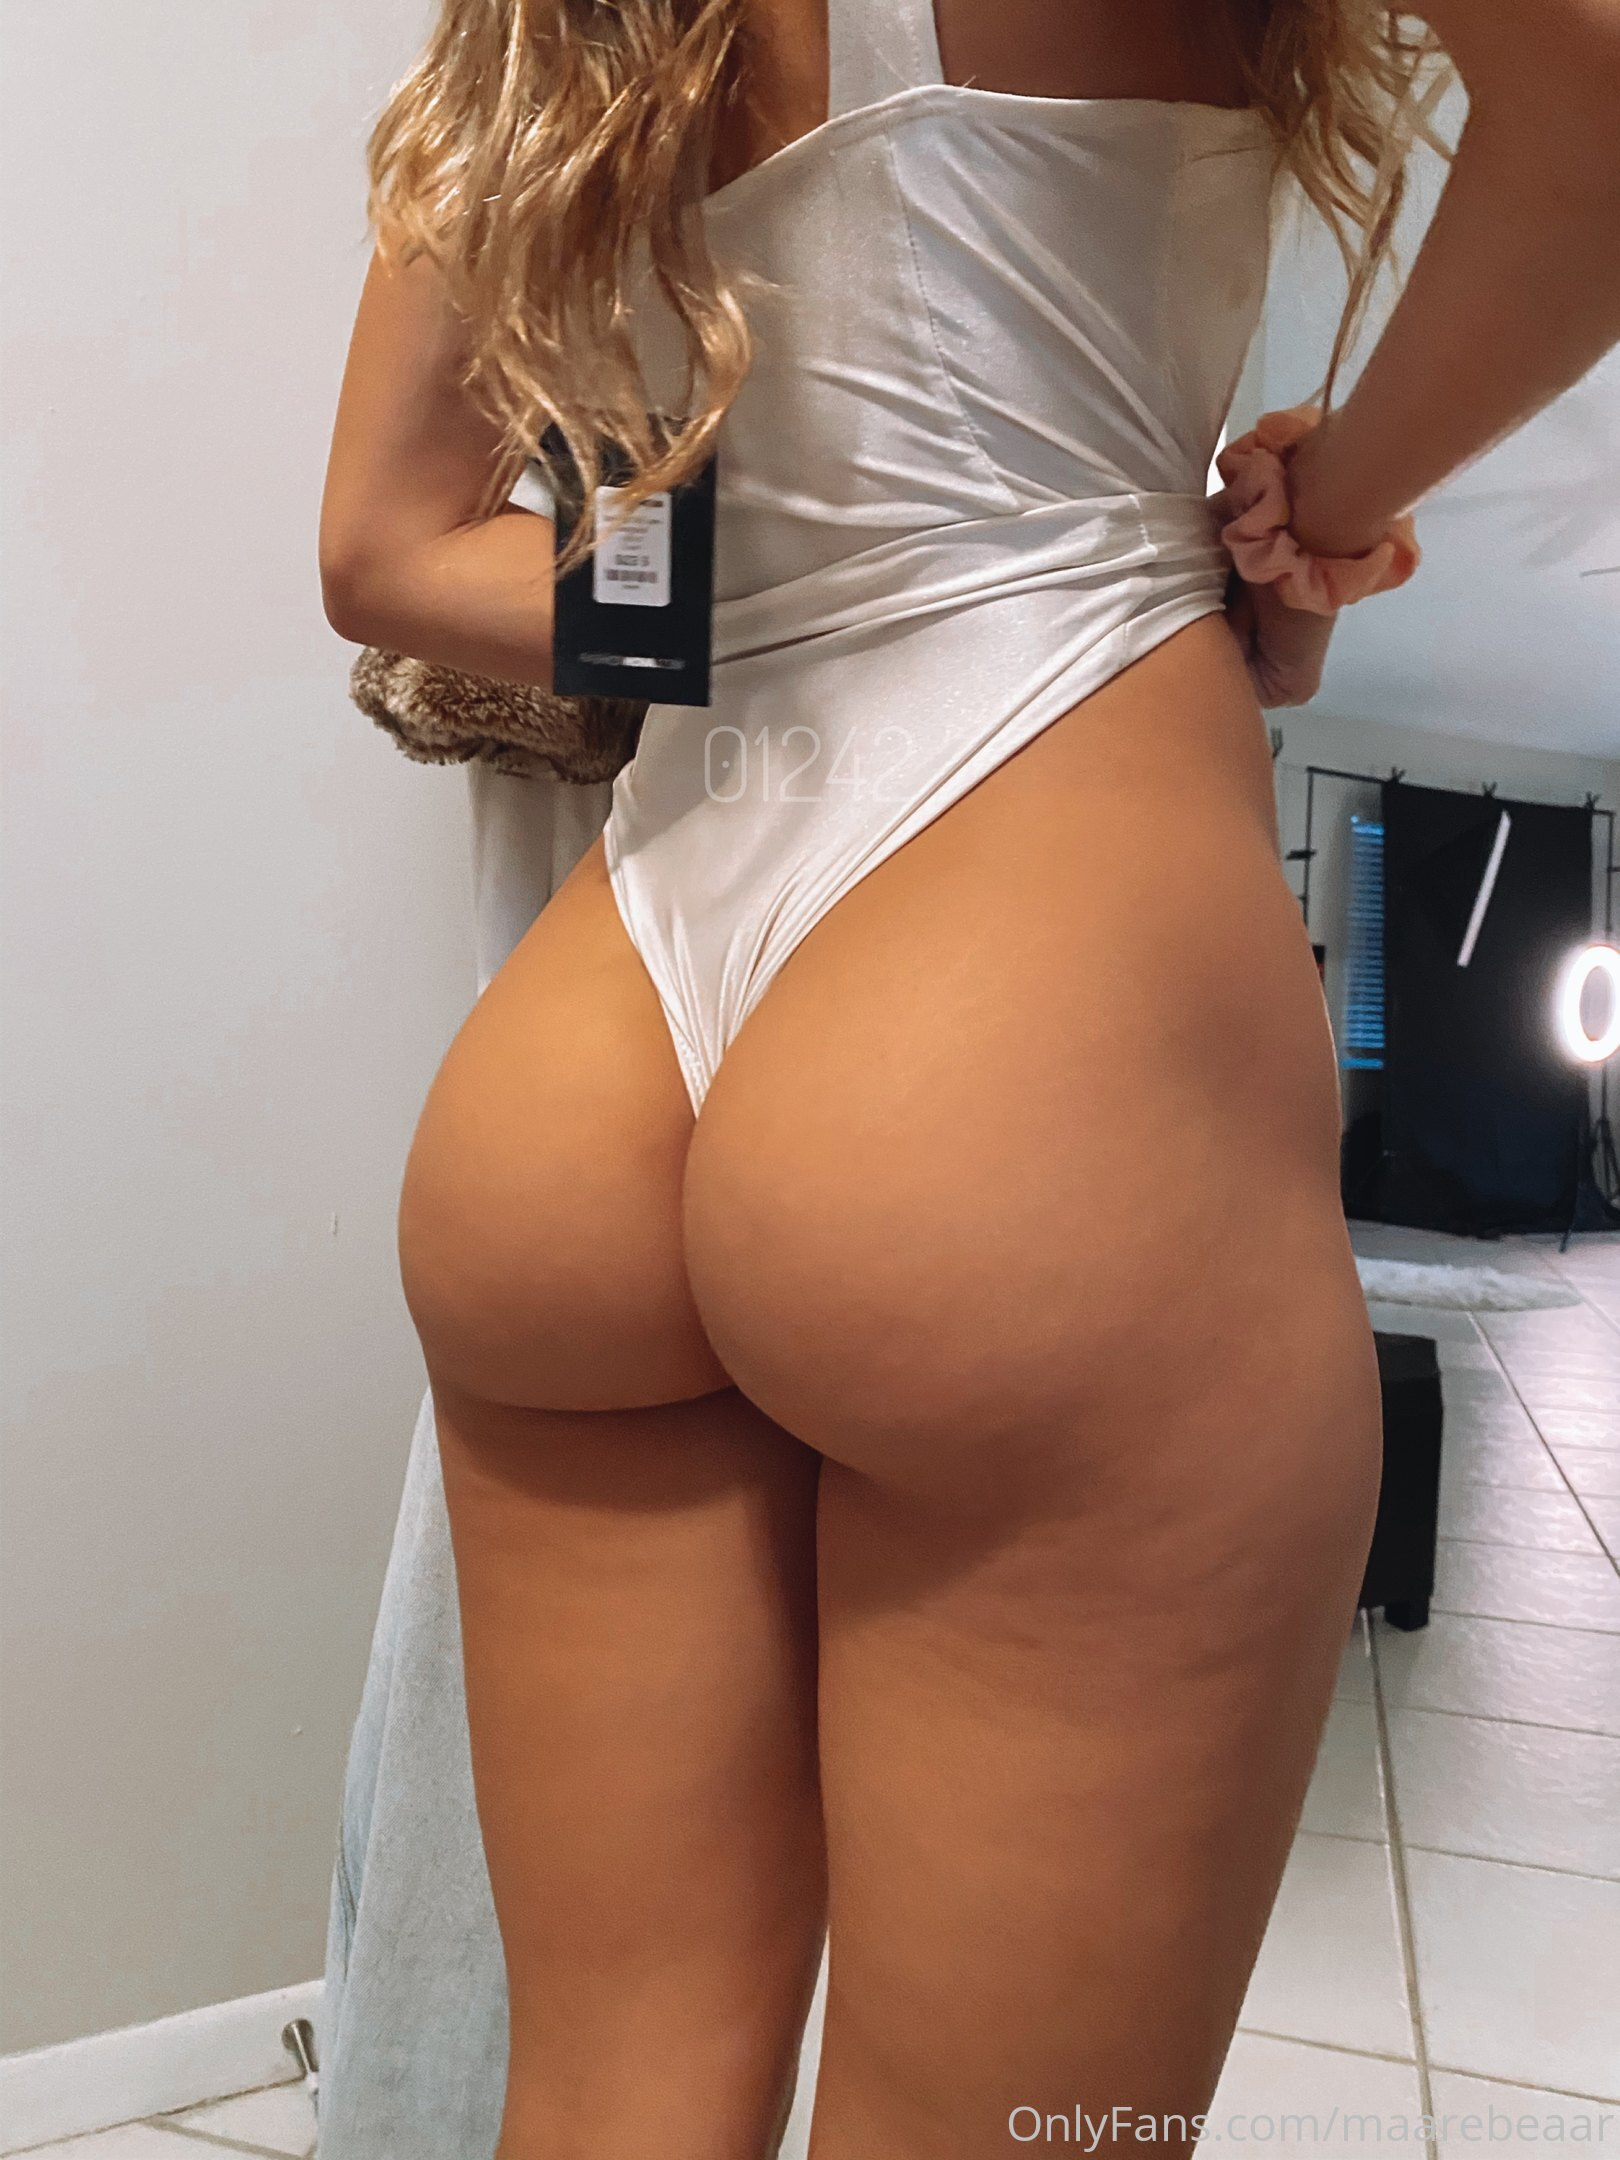 Mariana Morais Onlyfans 0054